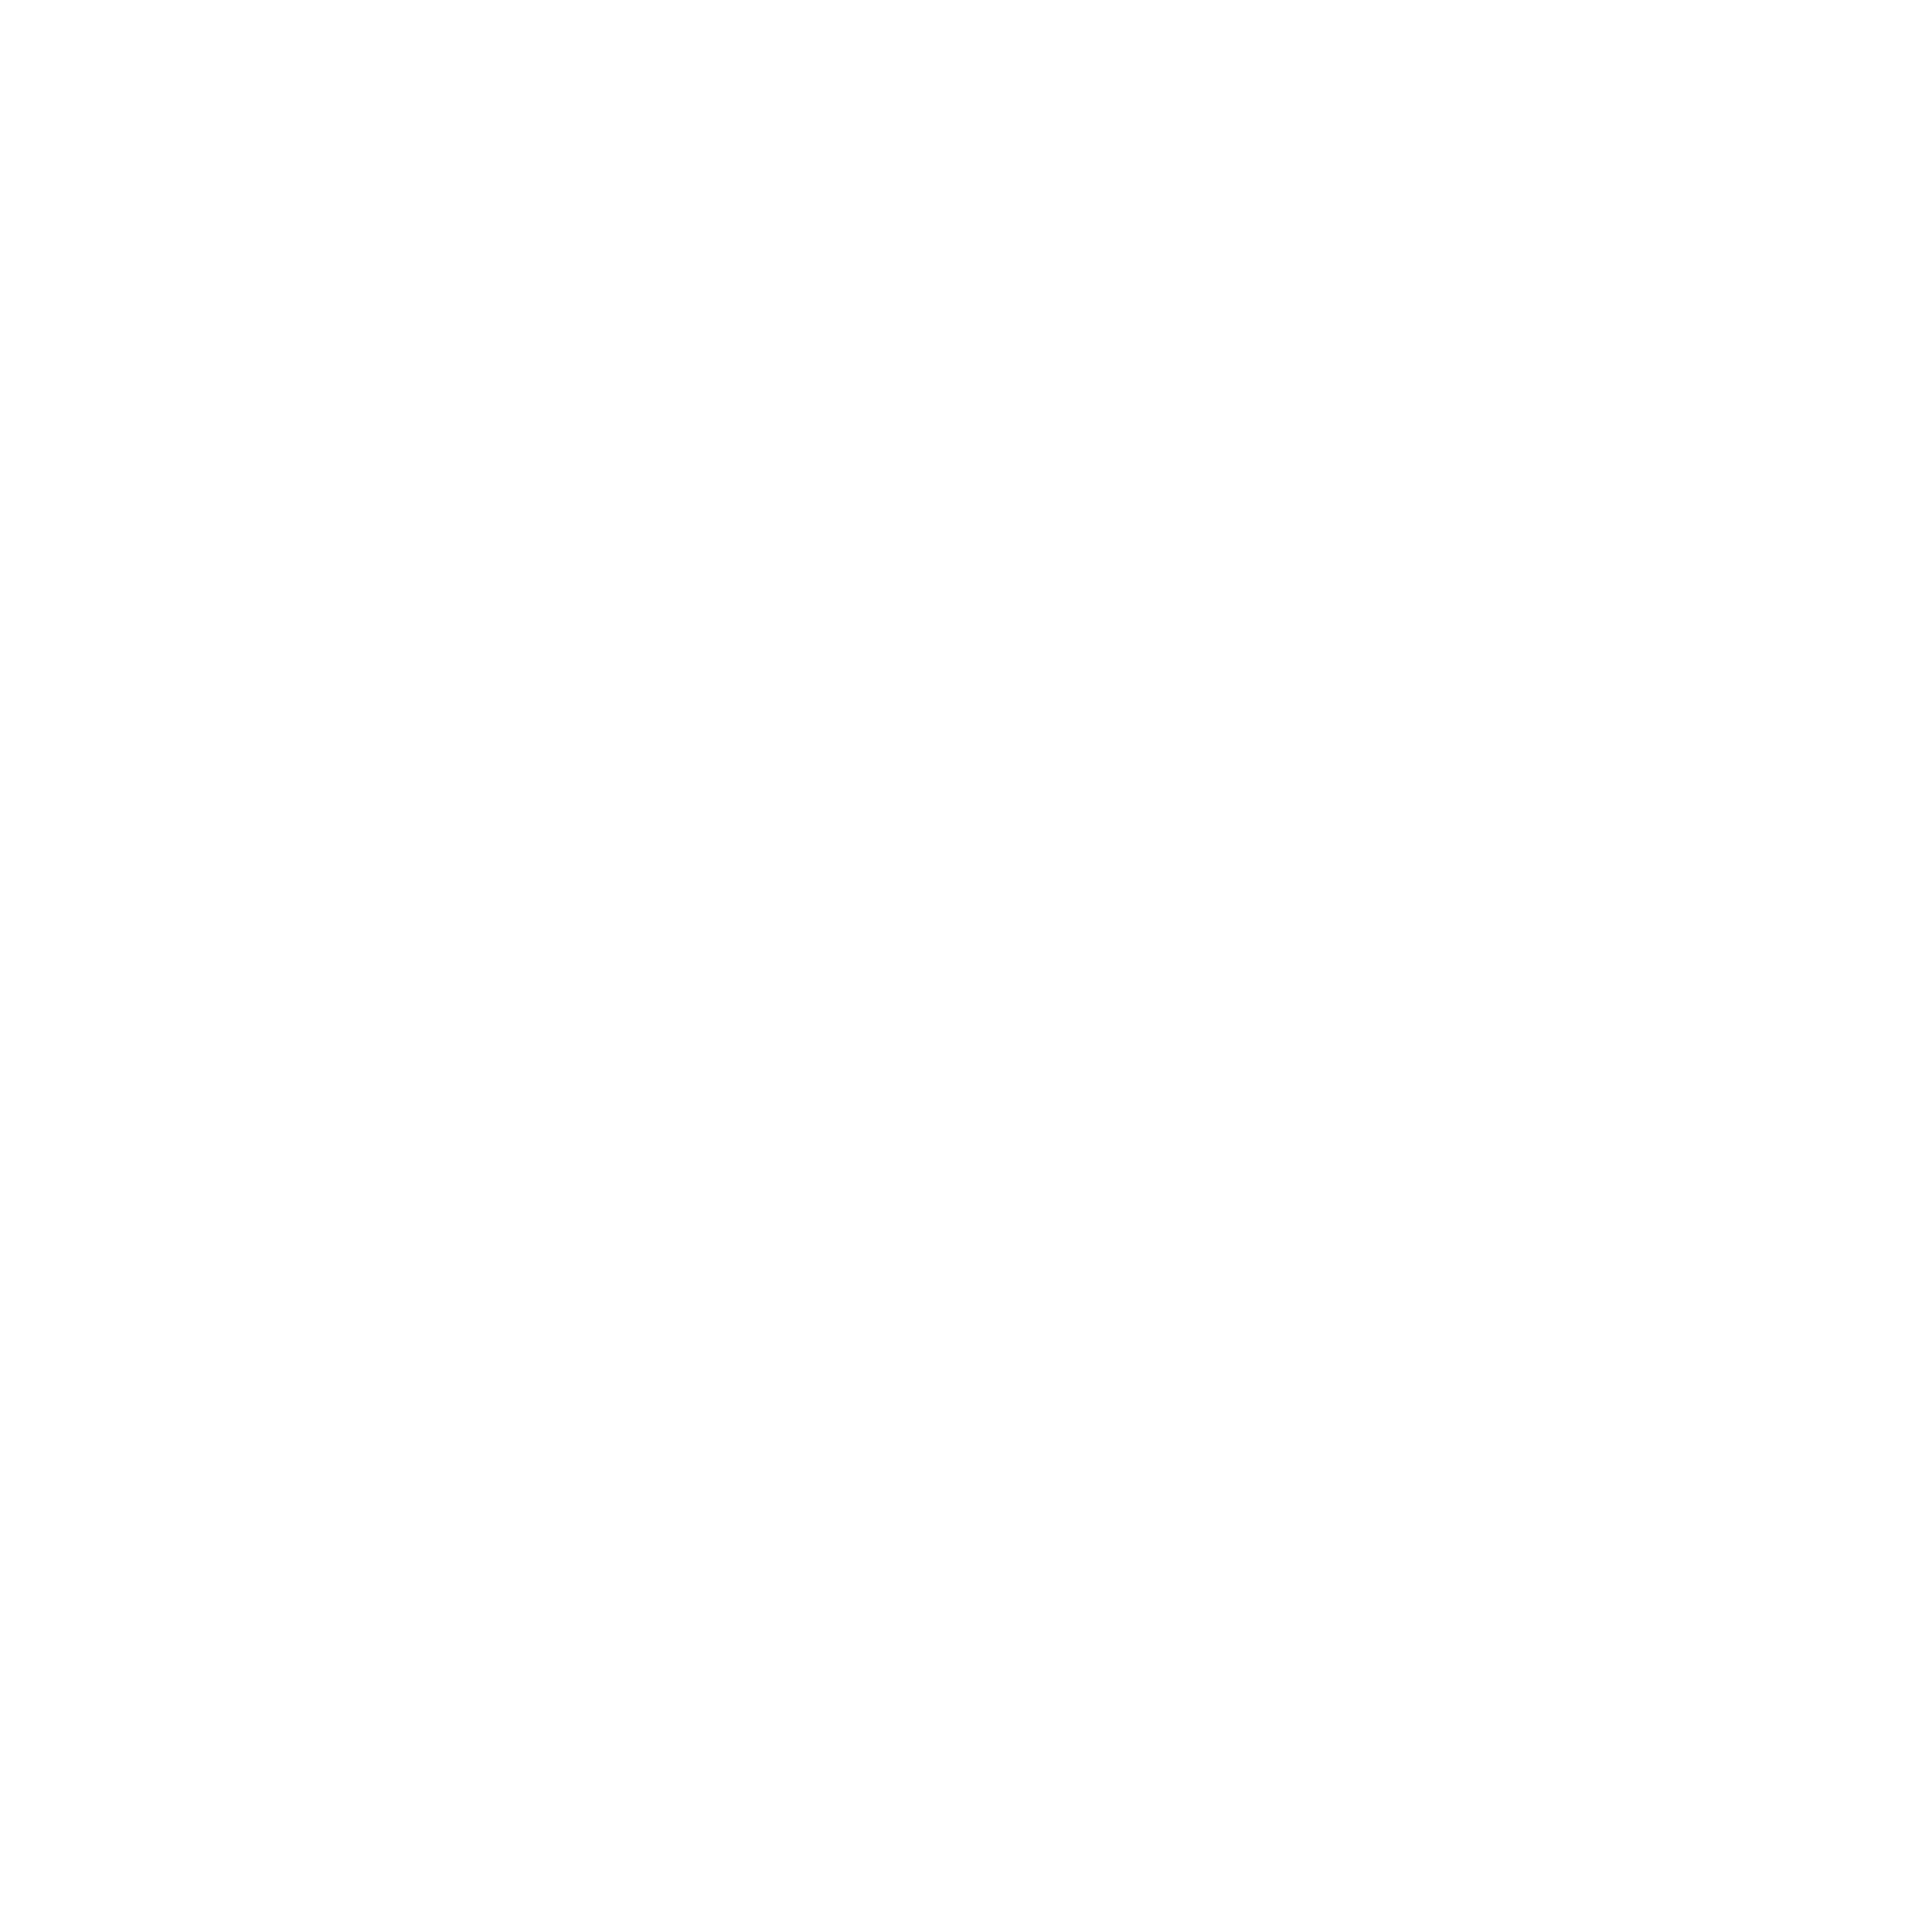 MedicalThree Logo.neg